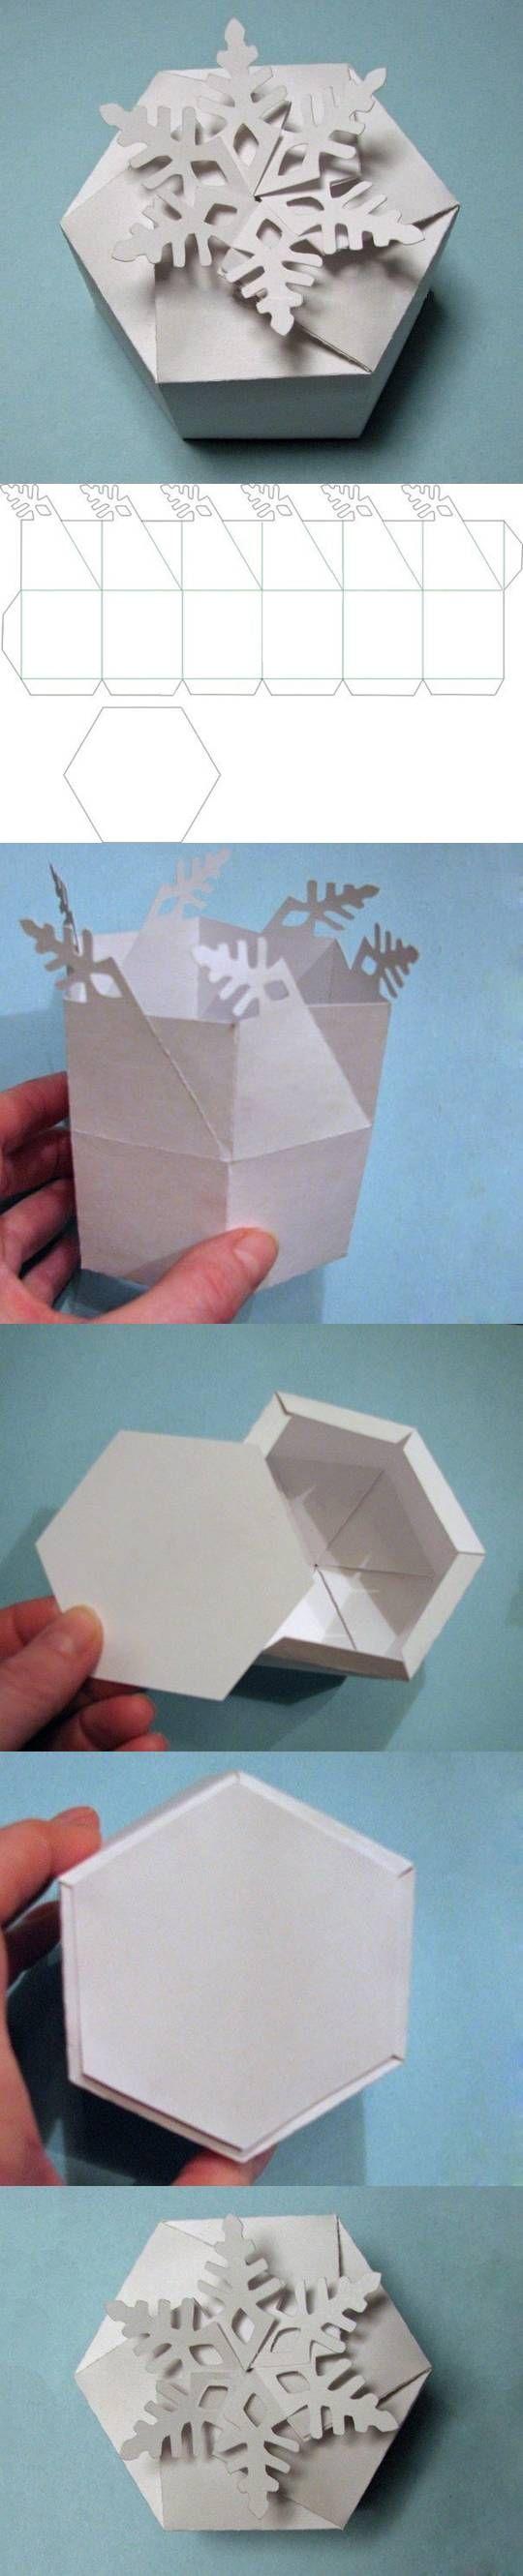 DIY Snowflake Gift Box DIY Projects | UsefulDIY.com